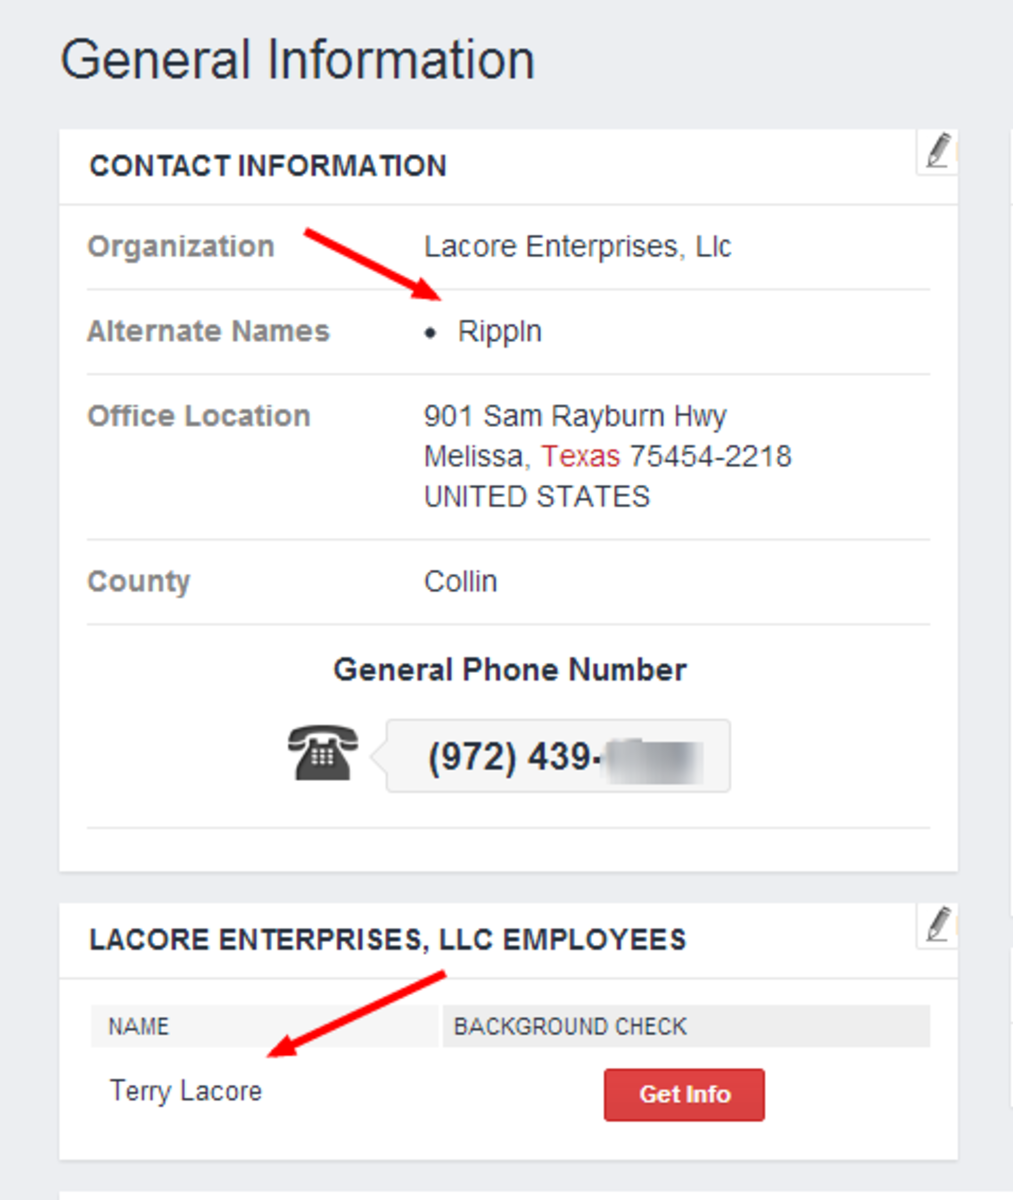 companies.findthecompany.com/l/31041663/Lacore-Enterprises-Llc-in-Melissa-TX